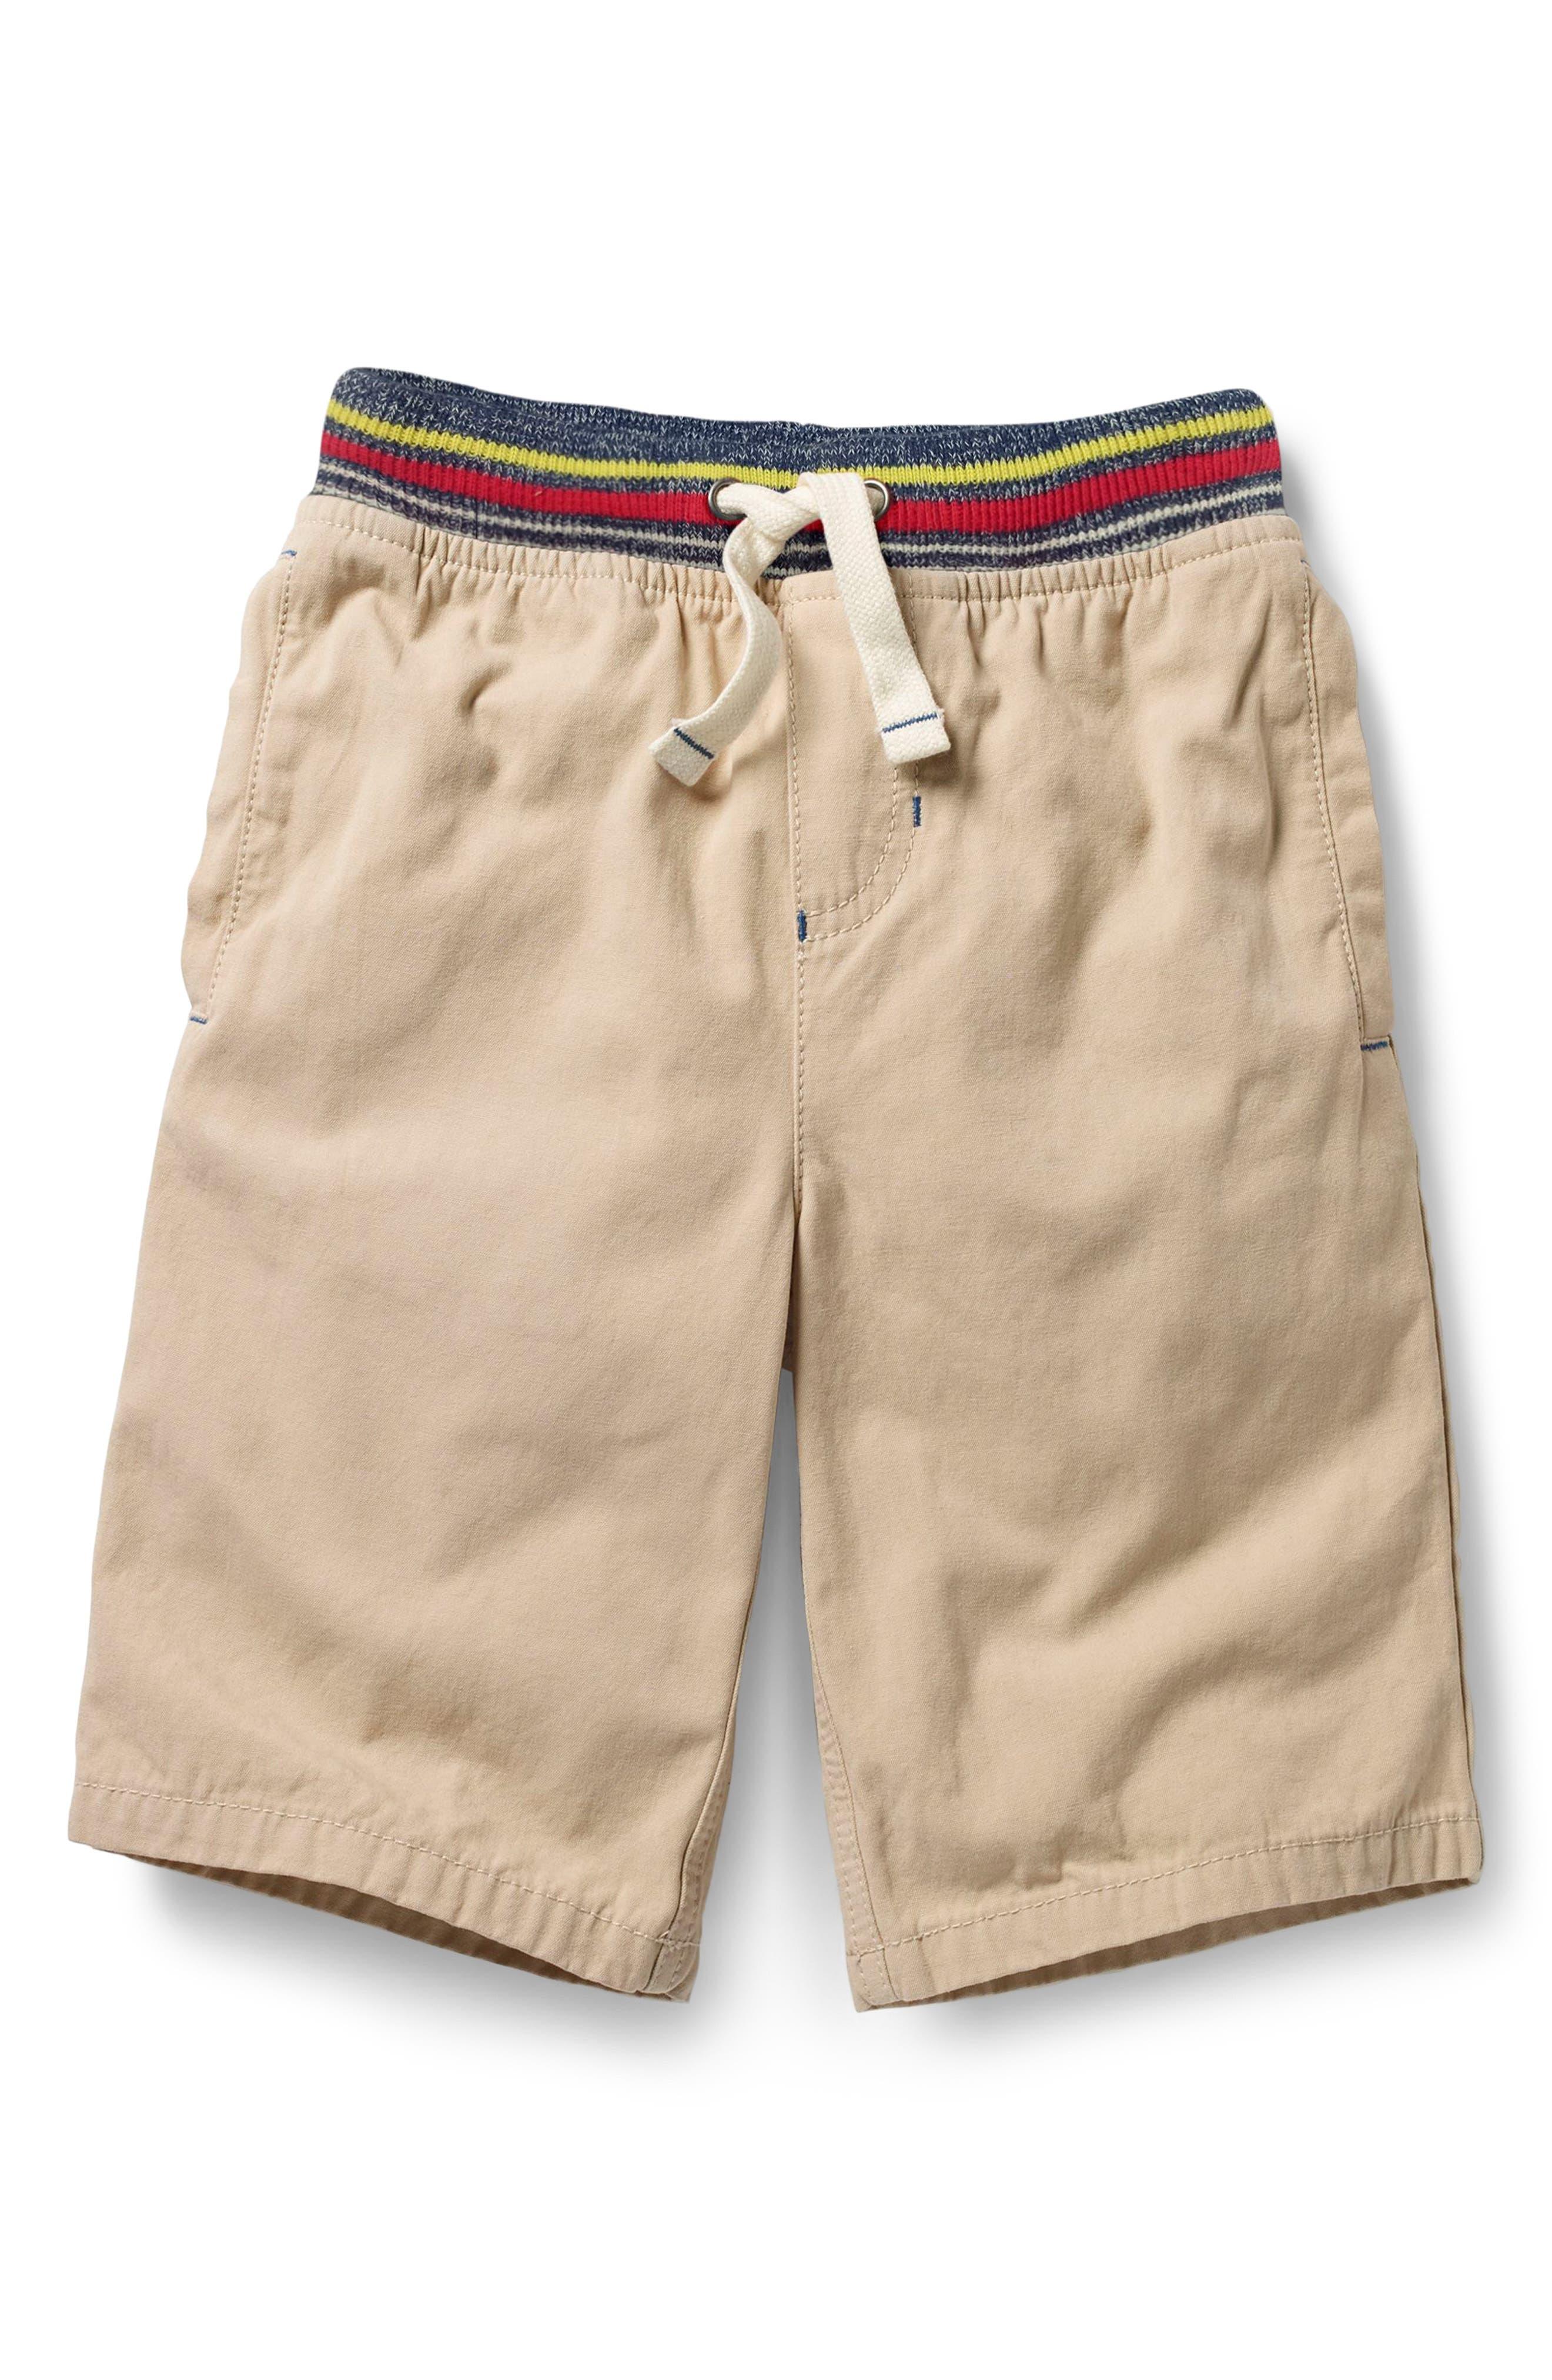 MINI BODEN Rib Waist Shorts, Main, color, 250